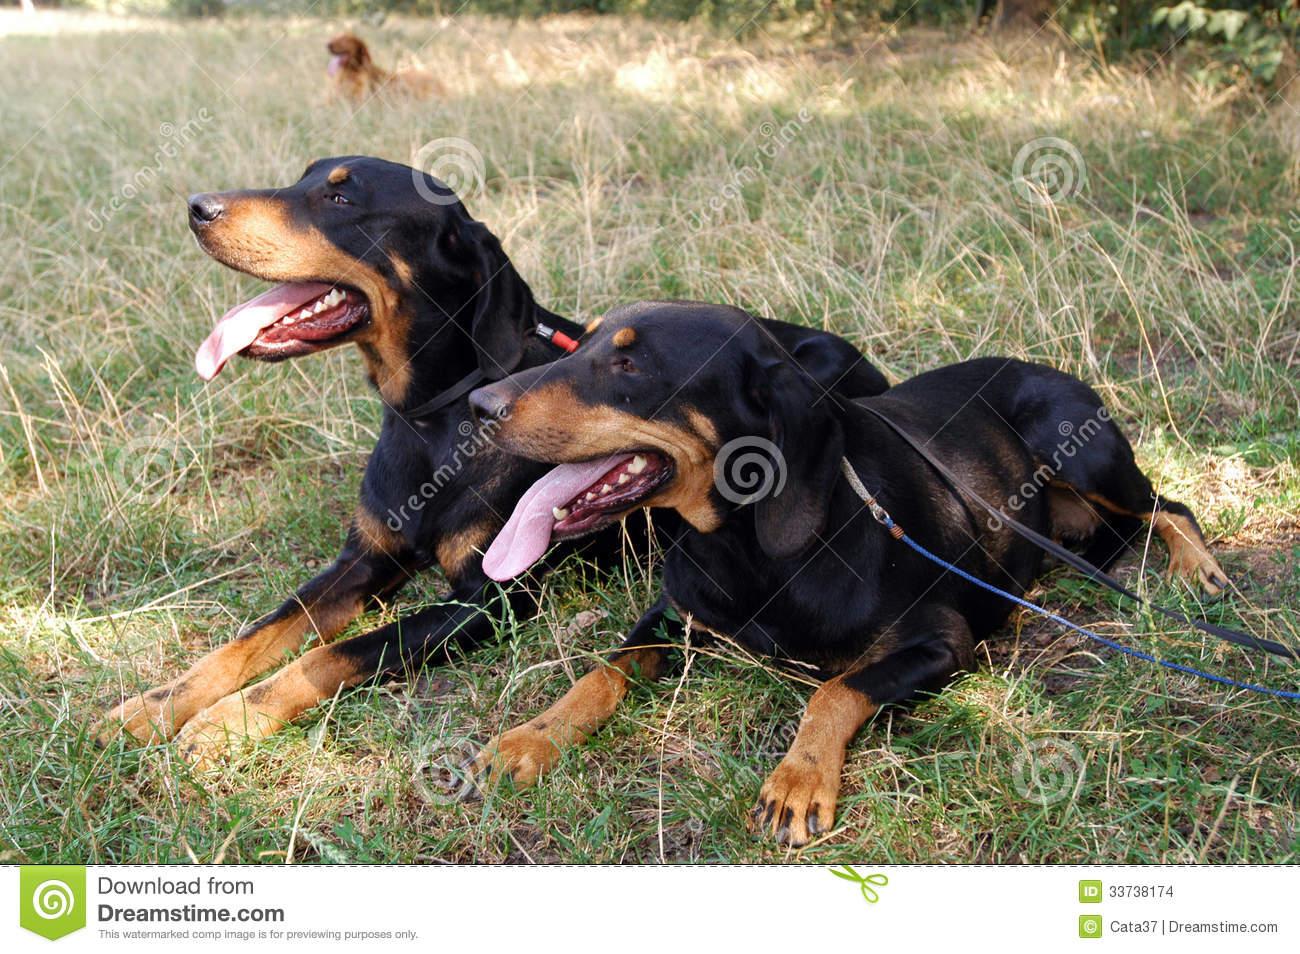 Transylvanian Hound Dog: Transylvanian Stock S Transylvanian Hound Two Dogs Lying Grass Breed